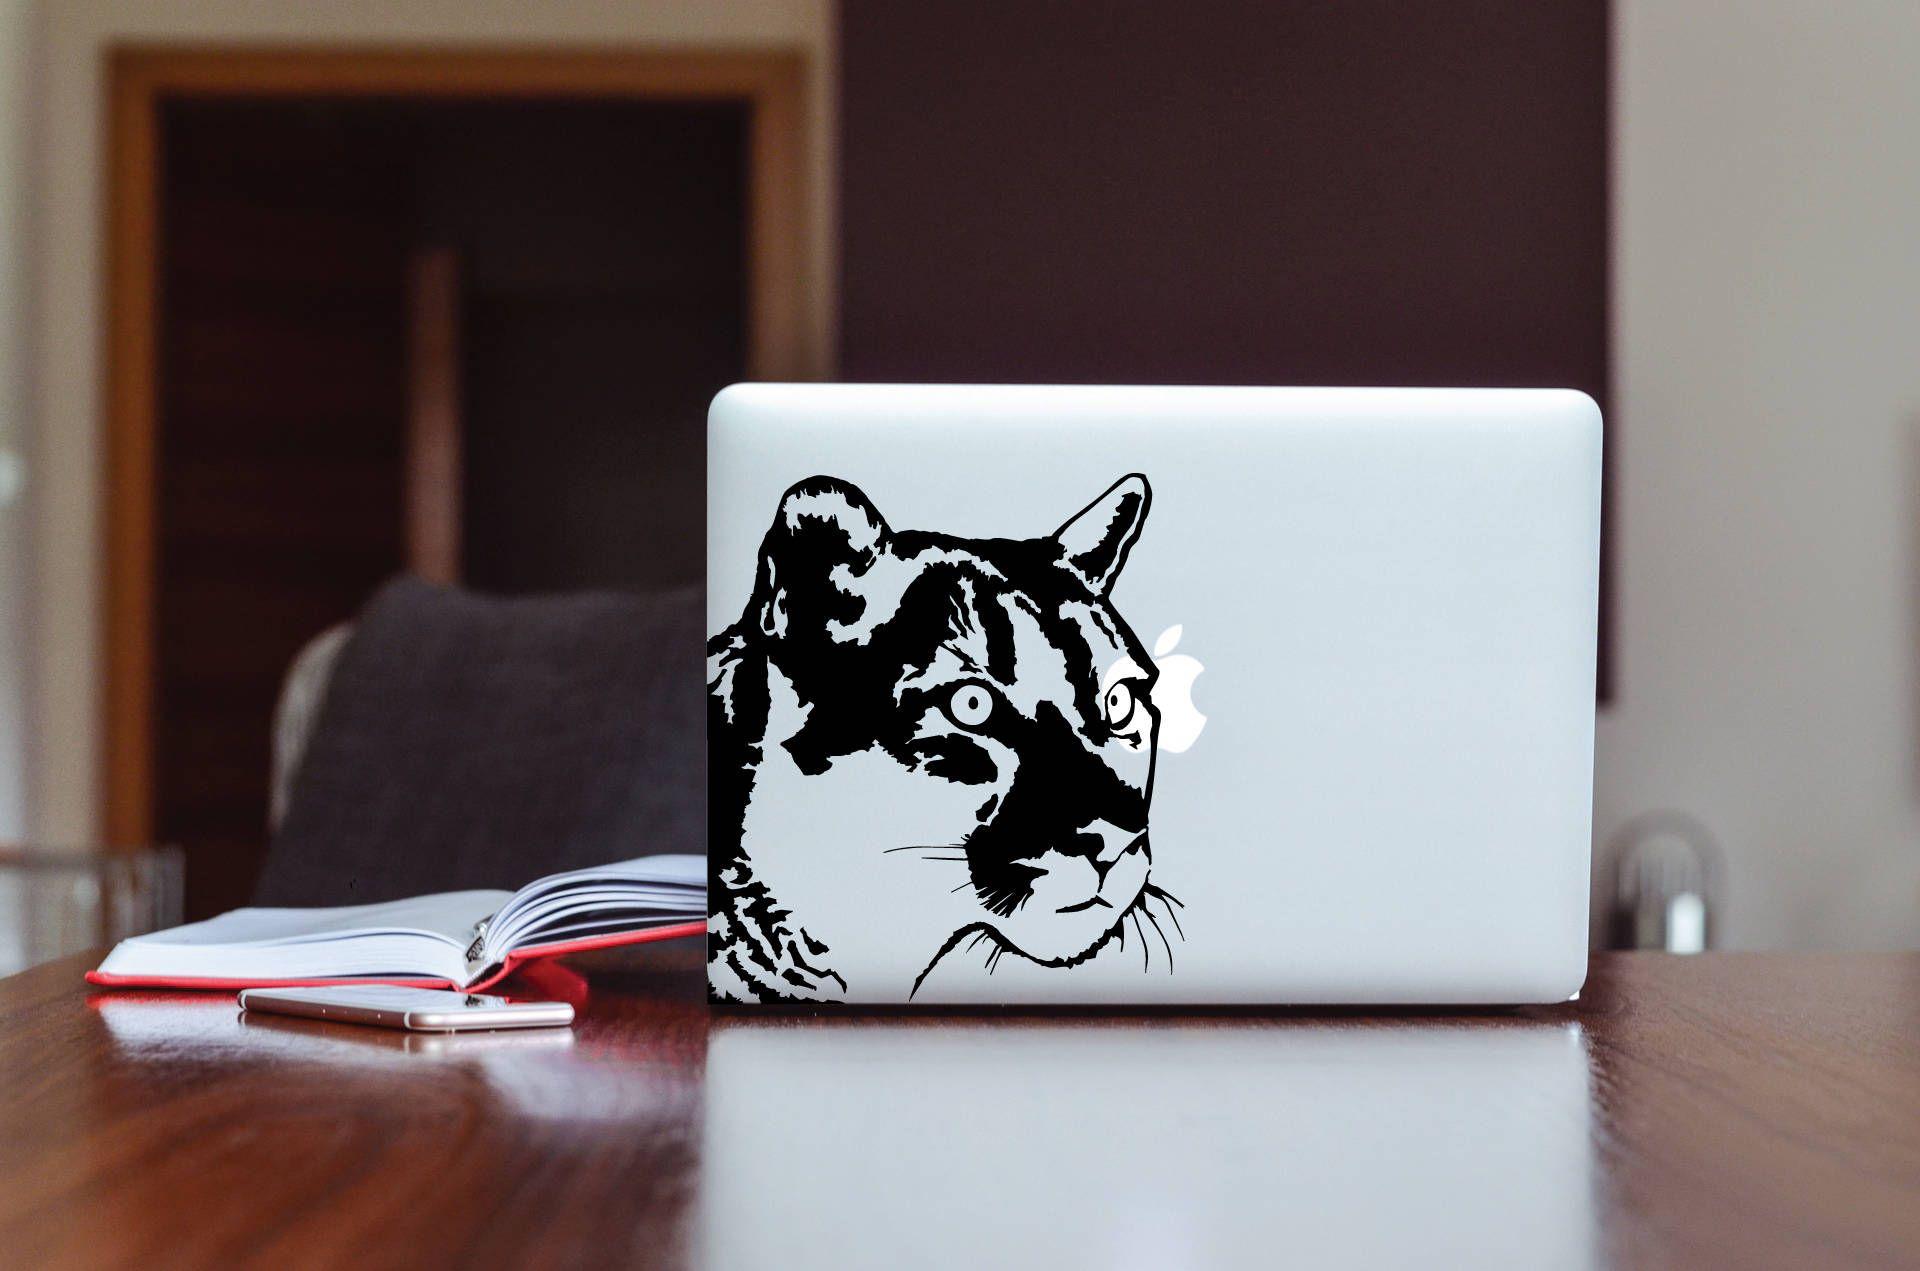 Wild cat wildlife puma jaguarpanteracougar mountain lion lioness decal design for macbooklaptop etc high quality matte vinyl sticker by